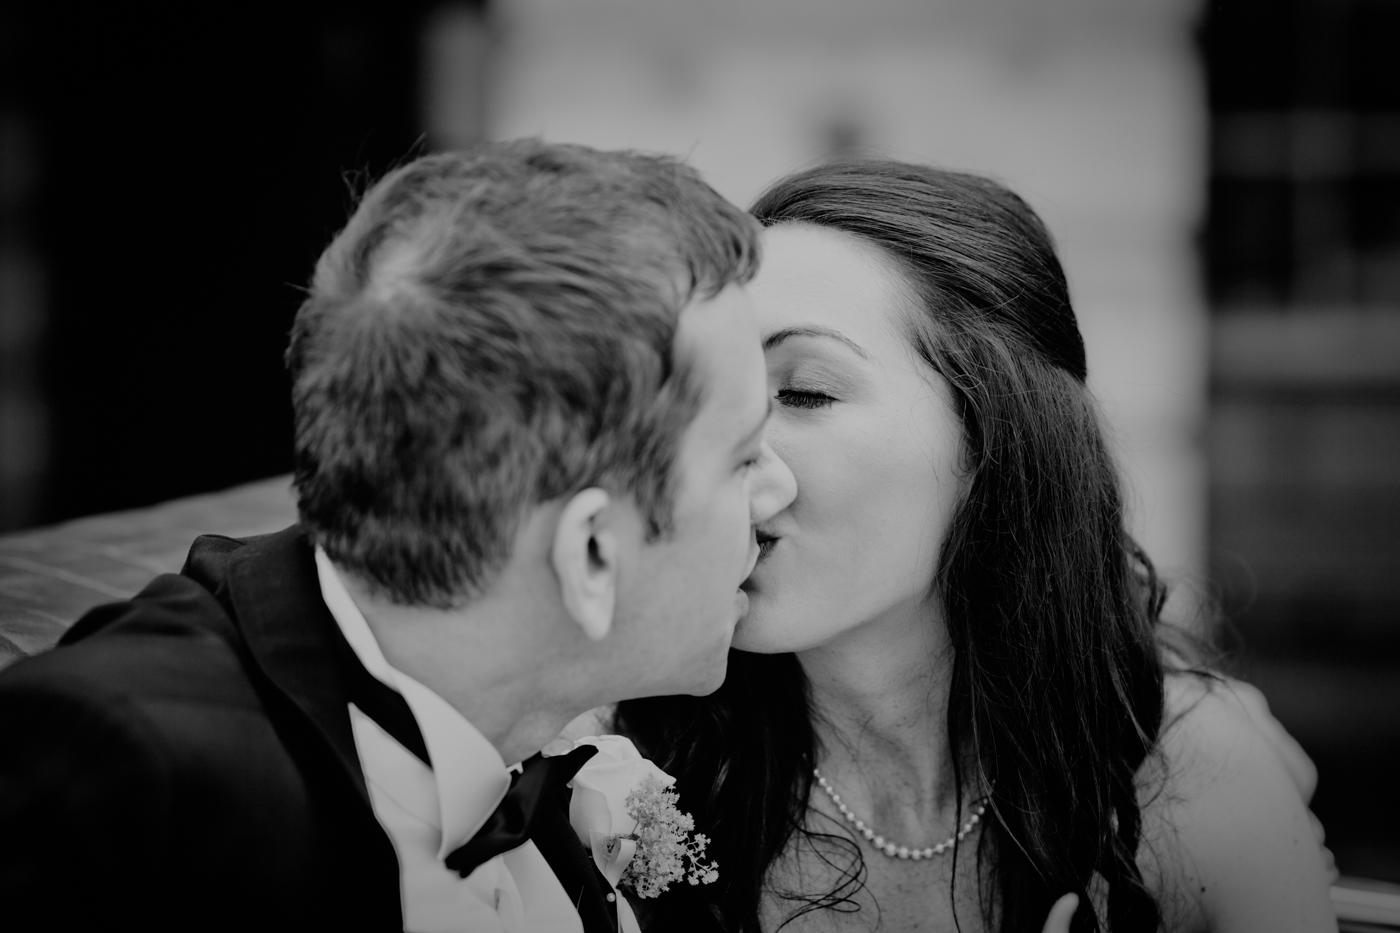 111 - Abi and Chris at Kedleston Hall - Wedding Photography by Mark Pugh www.markpugh.com - 0265.JPG